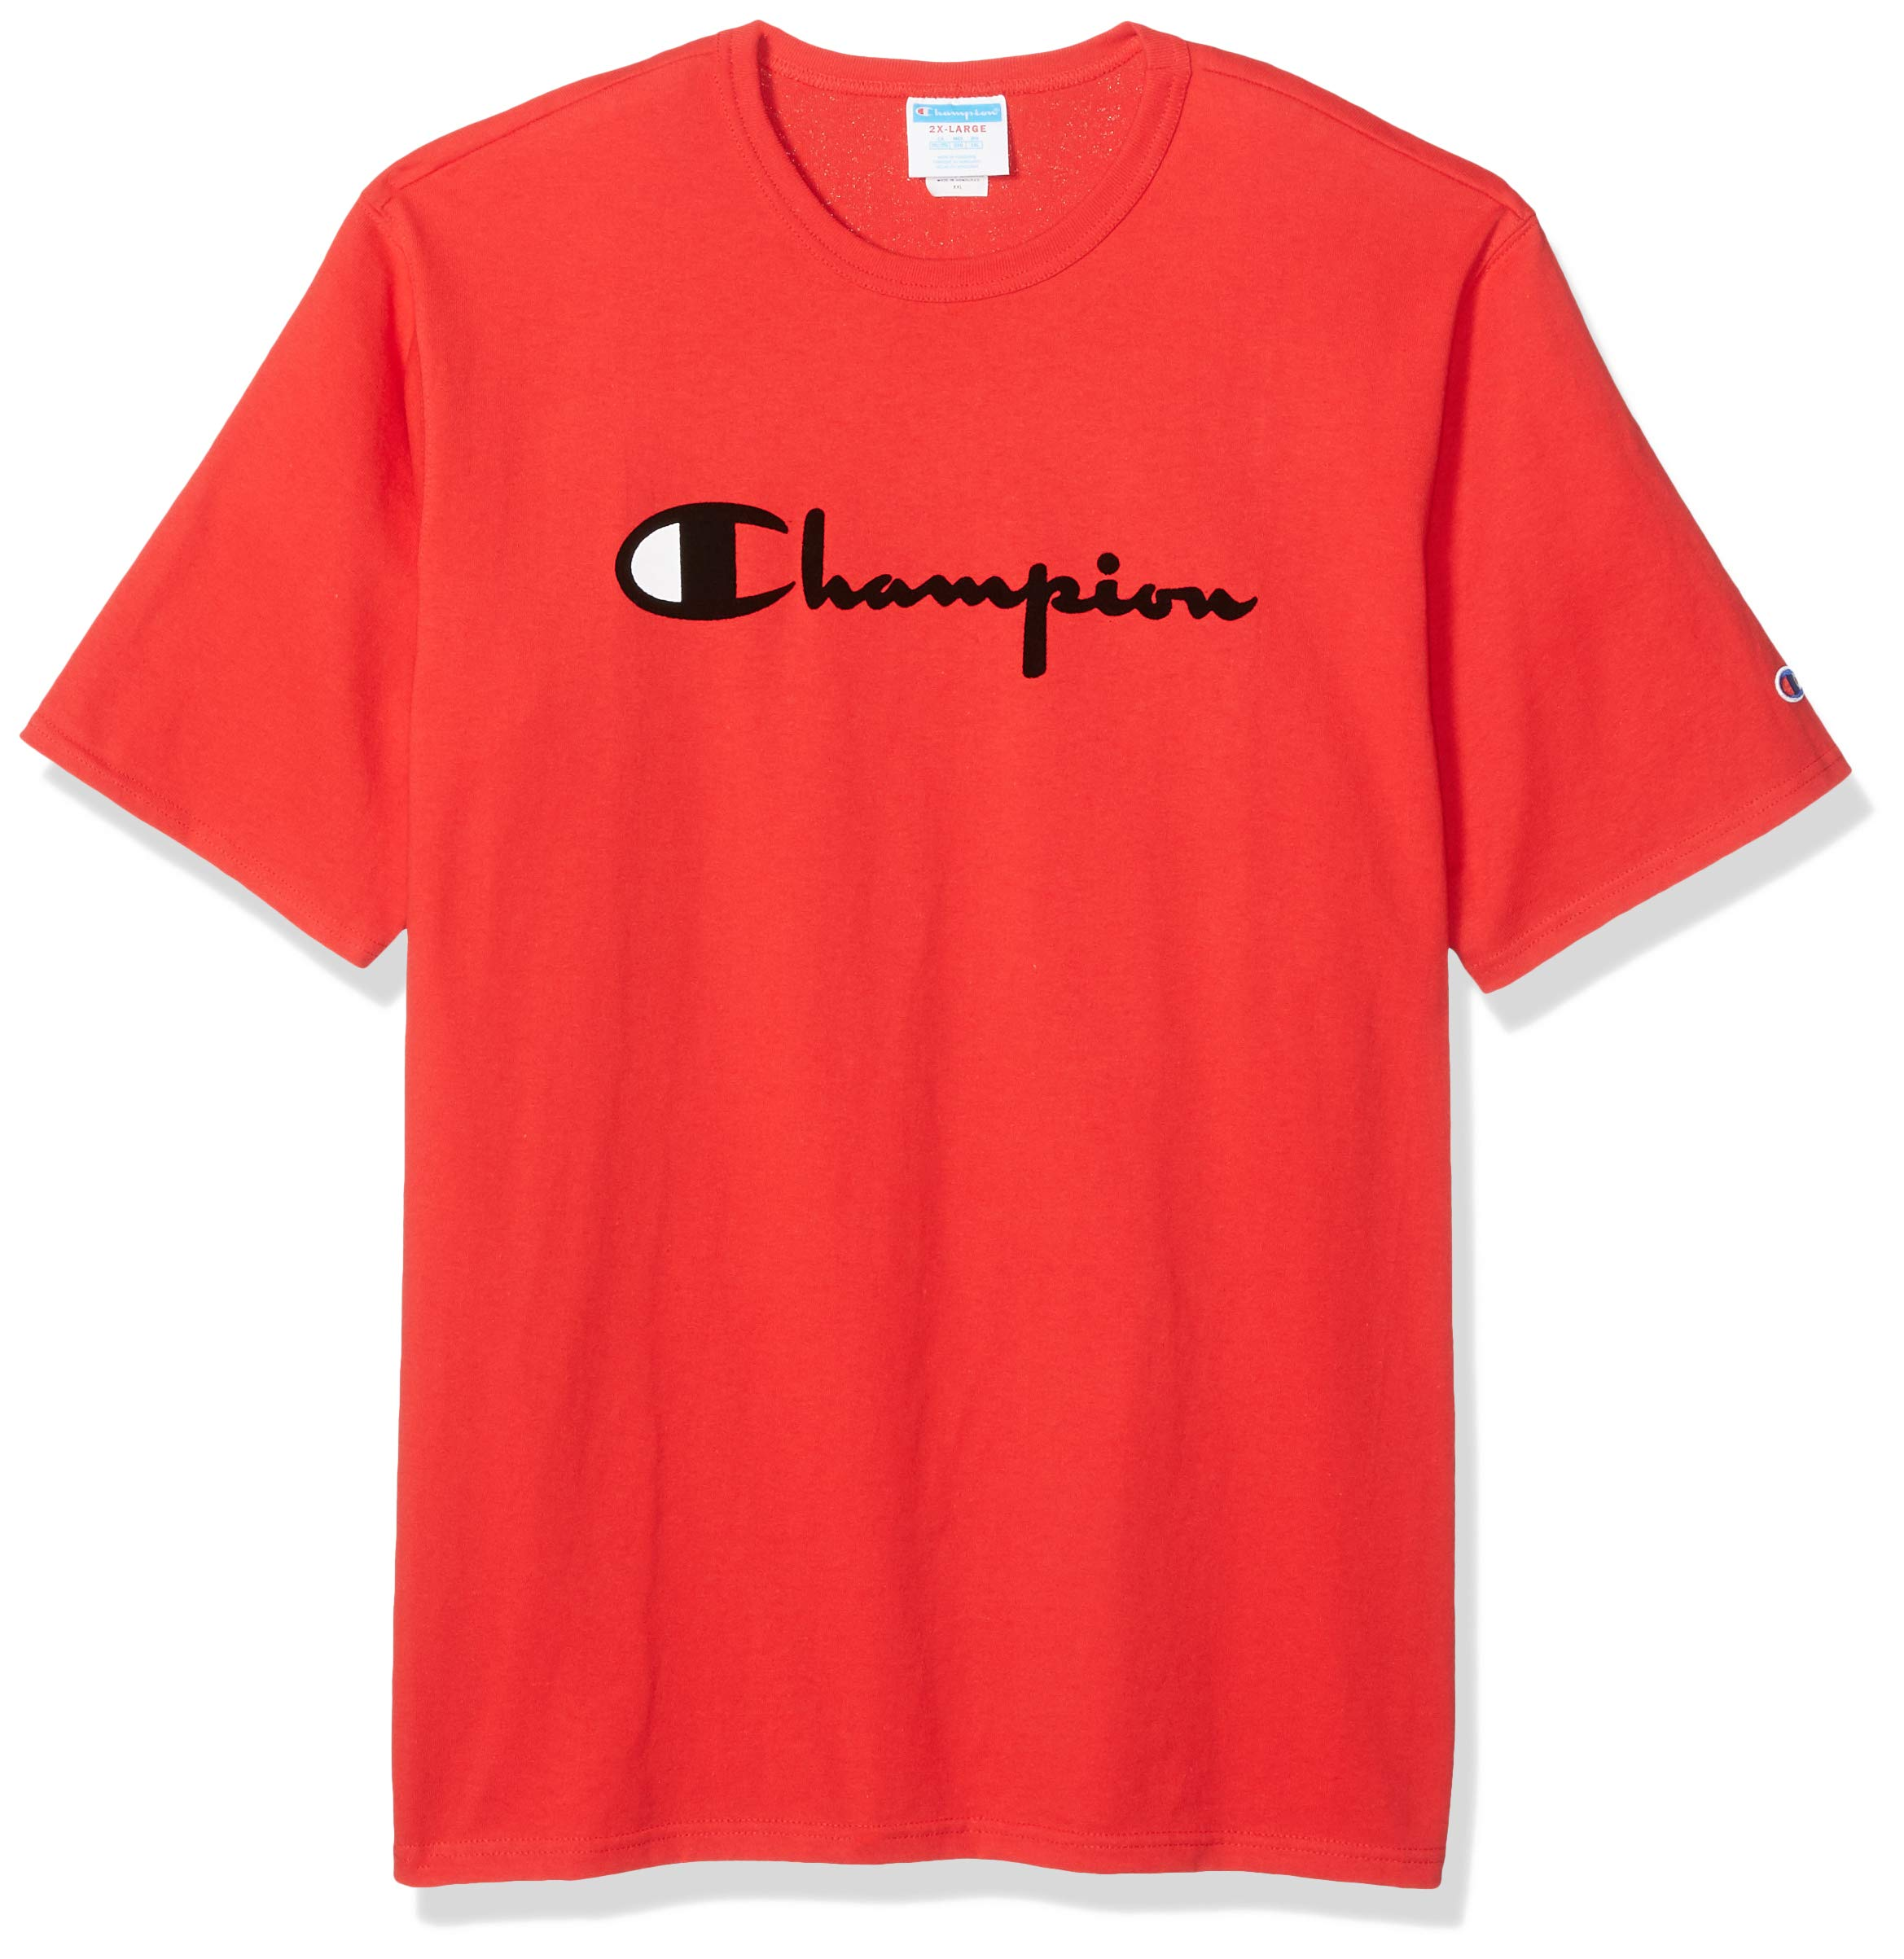 Champion LIFE Men's Heritage Tee, Team Red Scarlet W/Flock Script, 3X Large